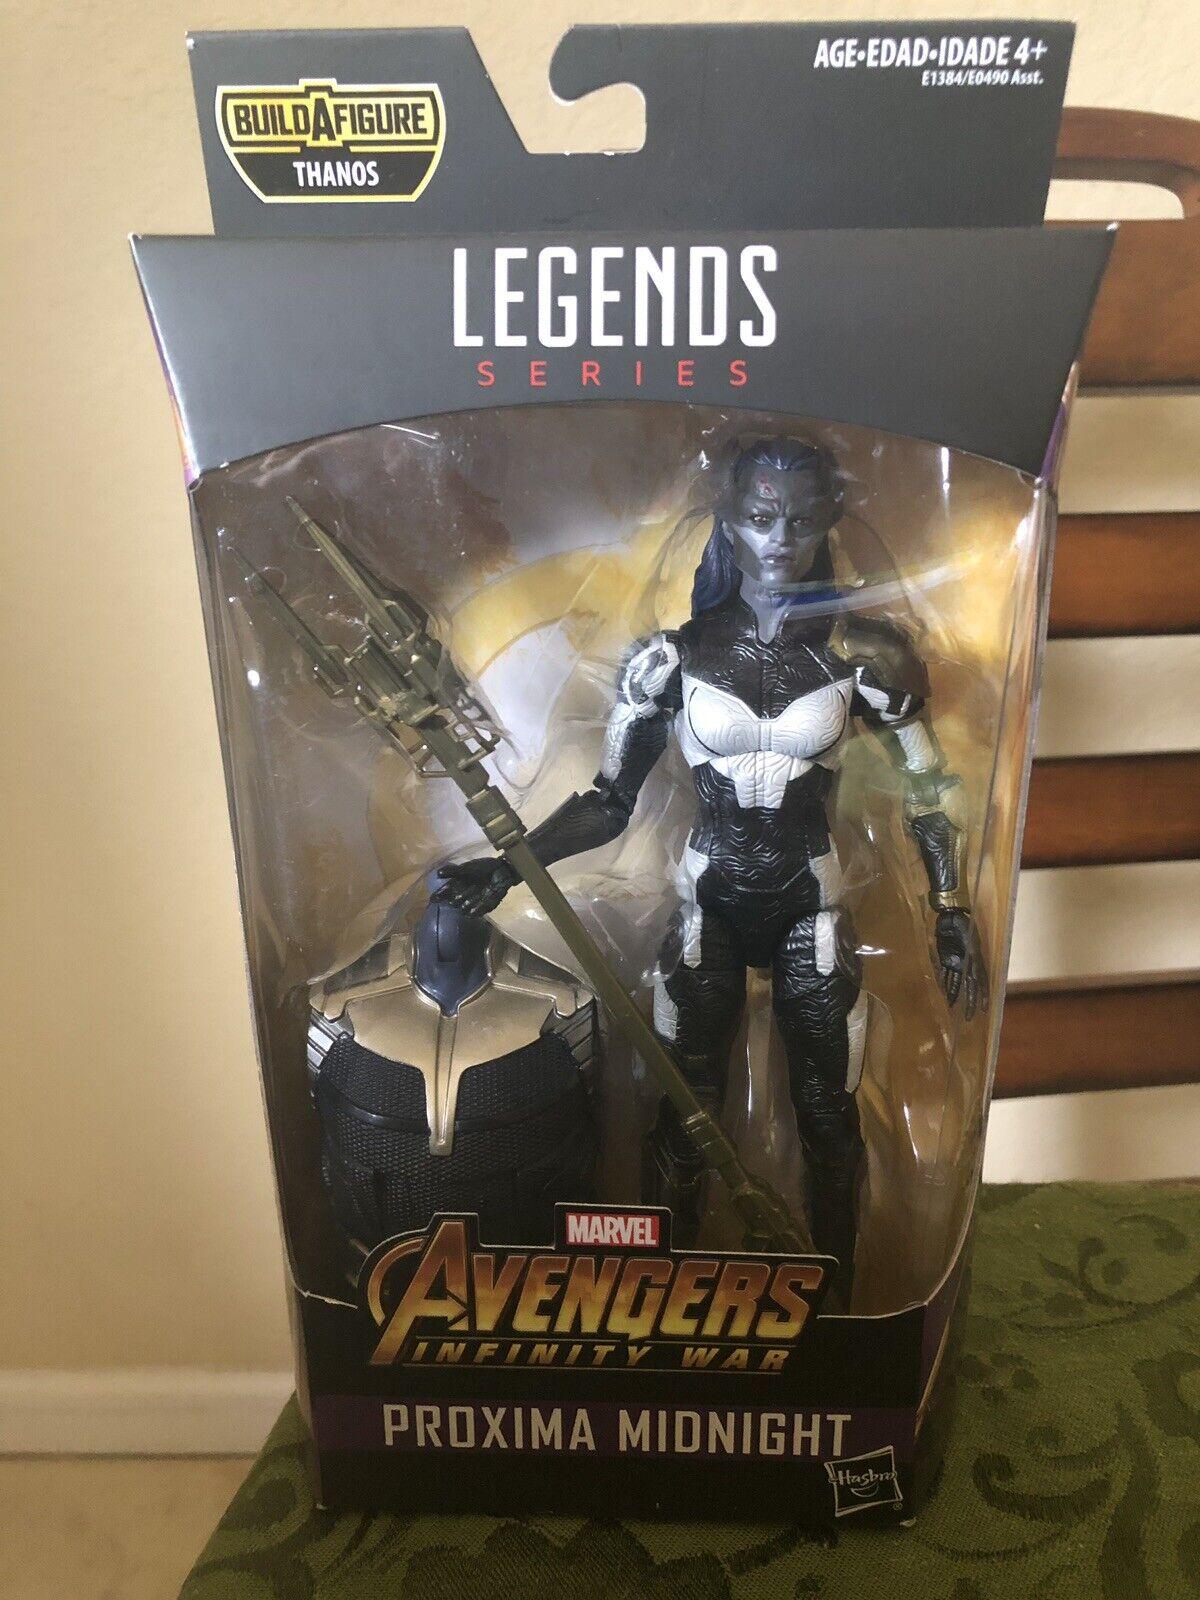 Marvel Legends Series Avengers Infinity War Proxima Midnight BAF Thanos